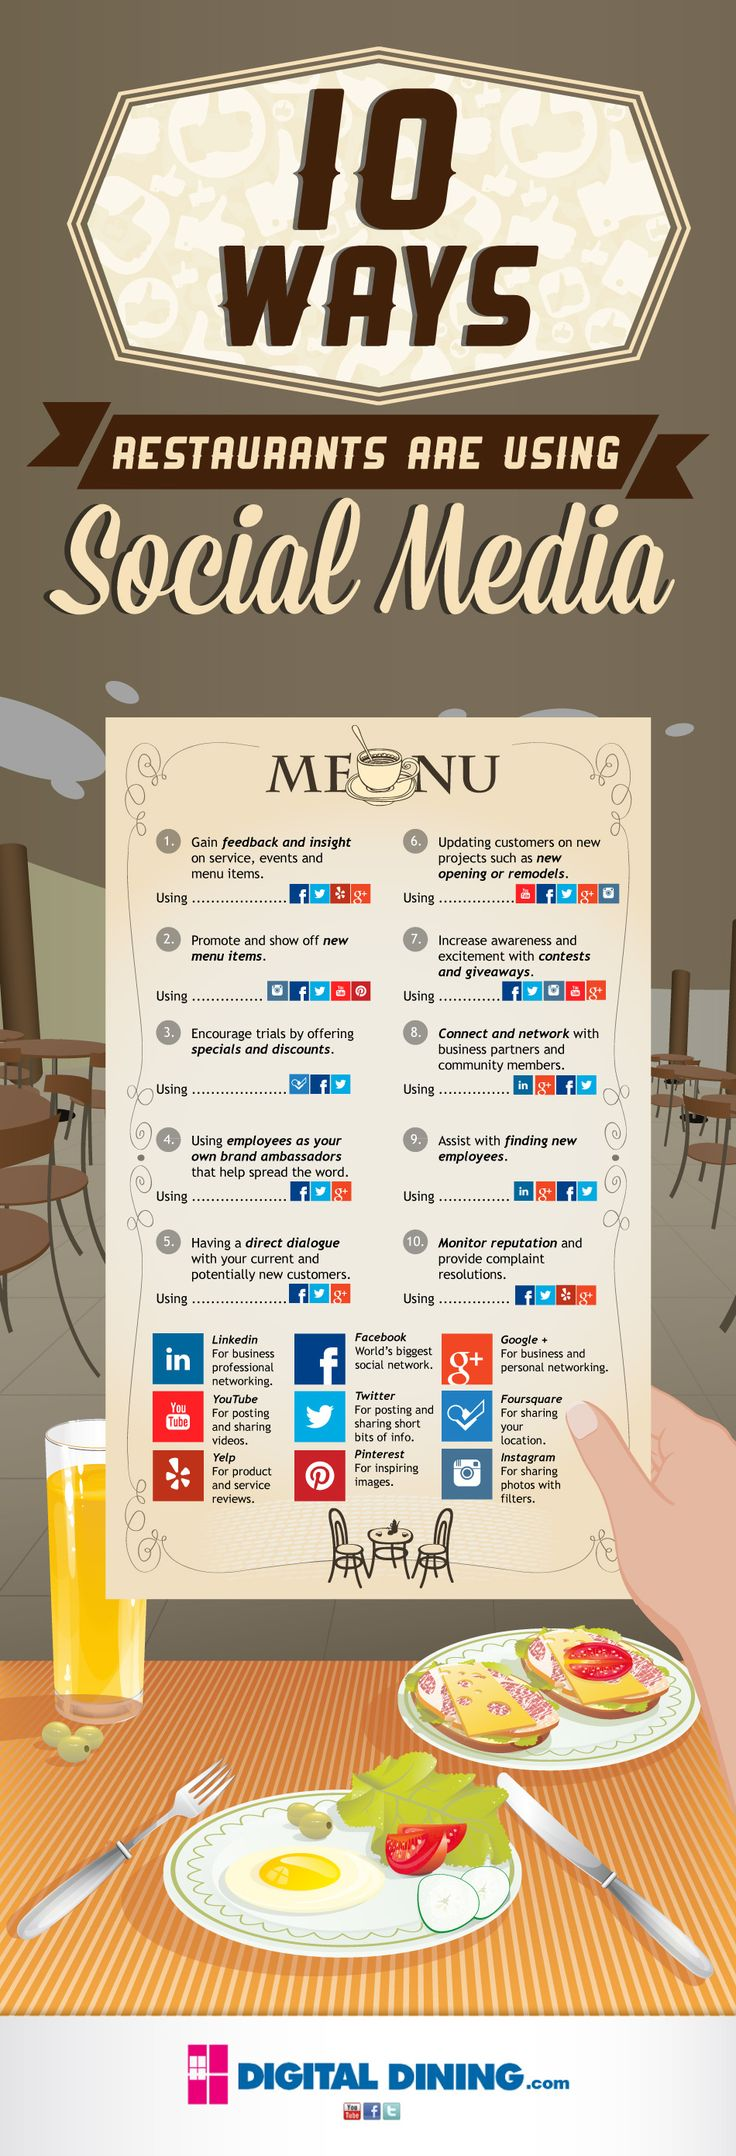 Best restaurant business images on pinterest